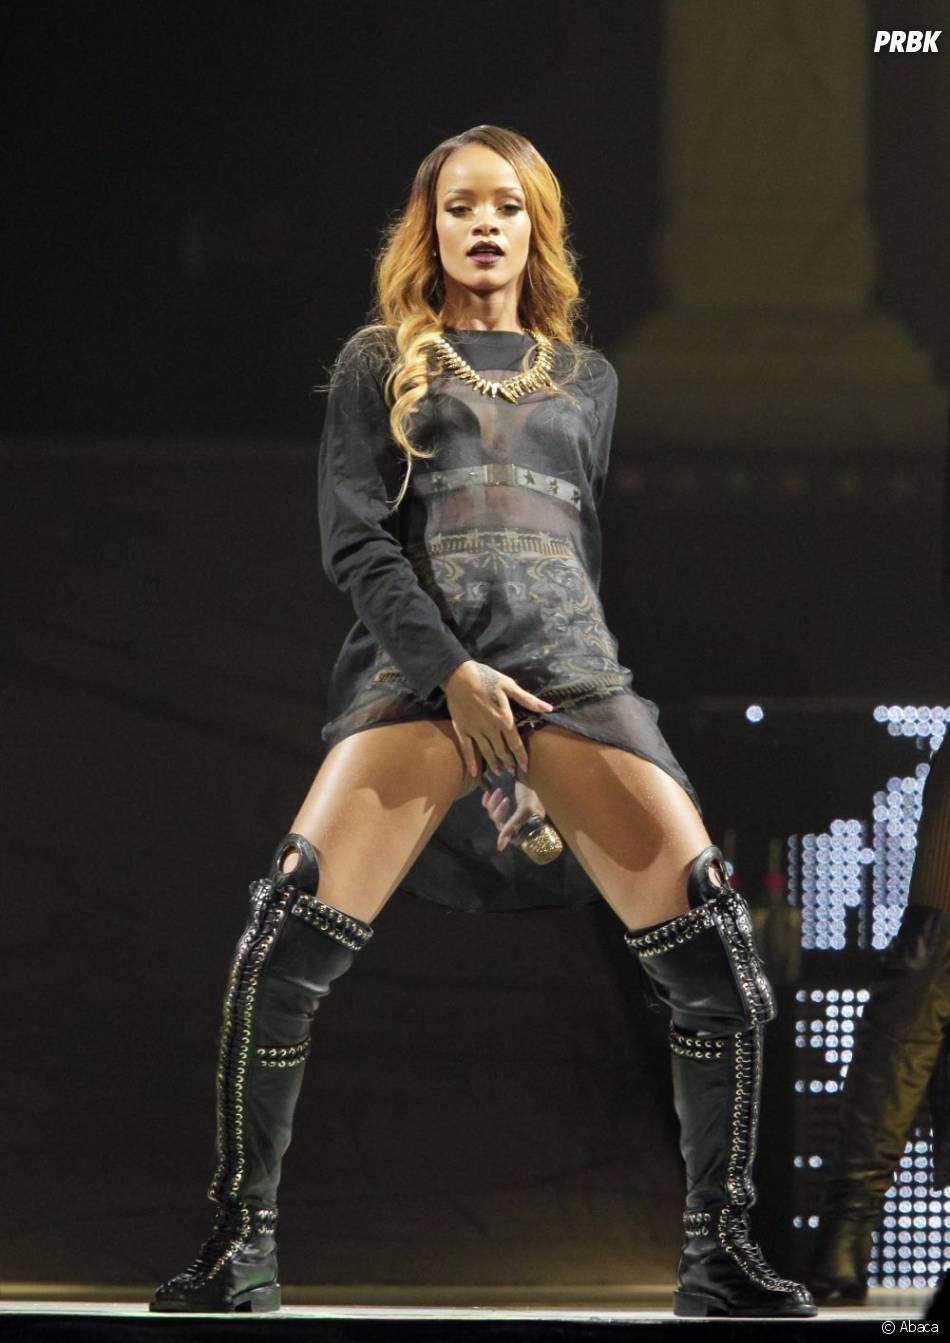 Le papa de Rihanna veut que sa fille soit heureuse